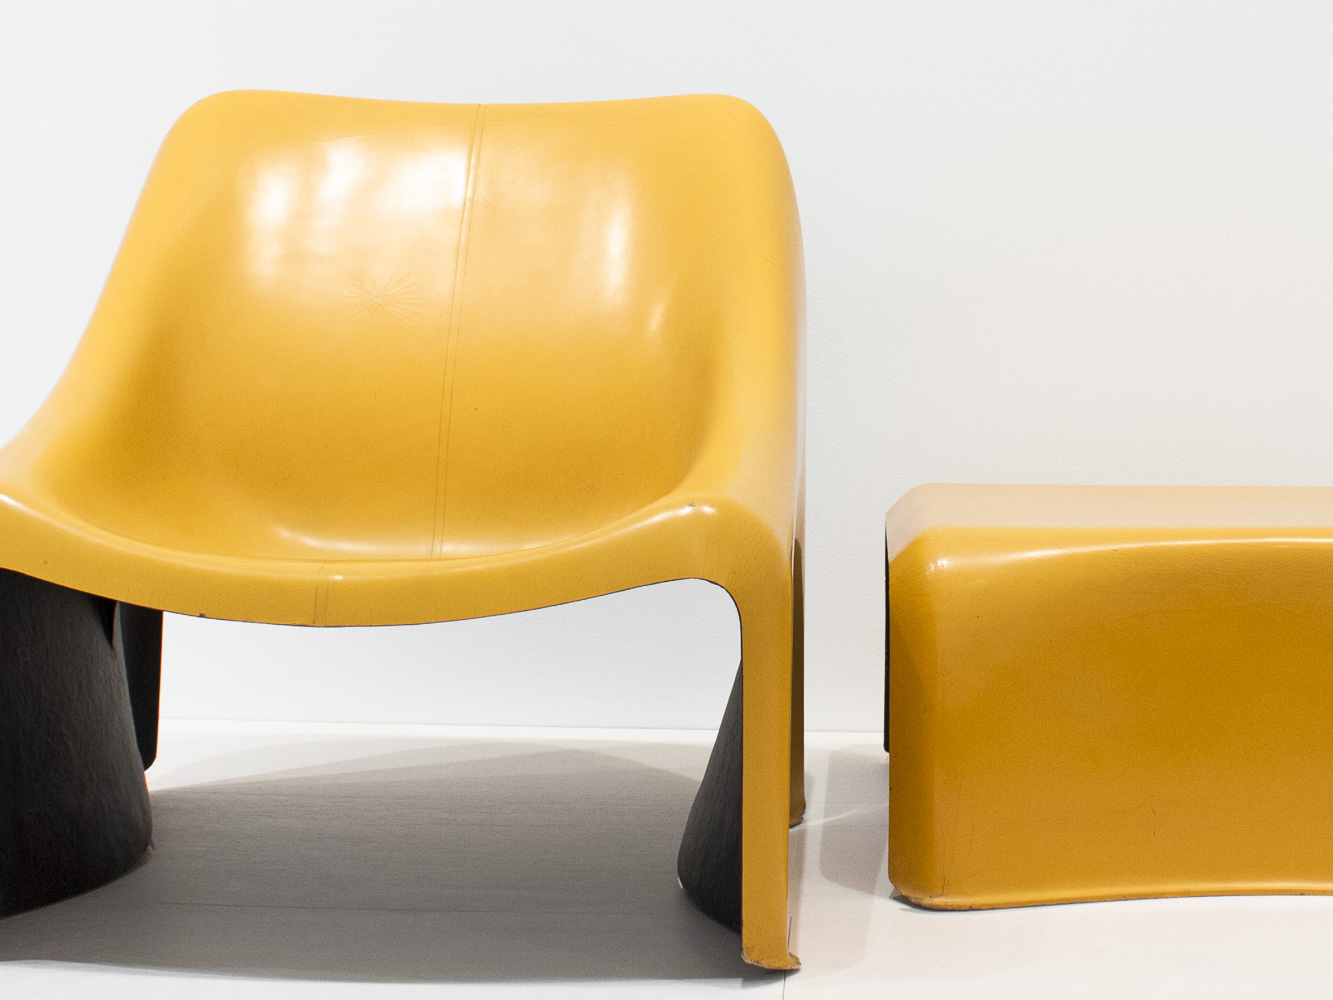 Heide Featherston Exhibition Cantilever Interiors Furniture Design (95).JPG